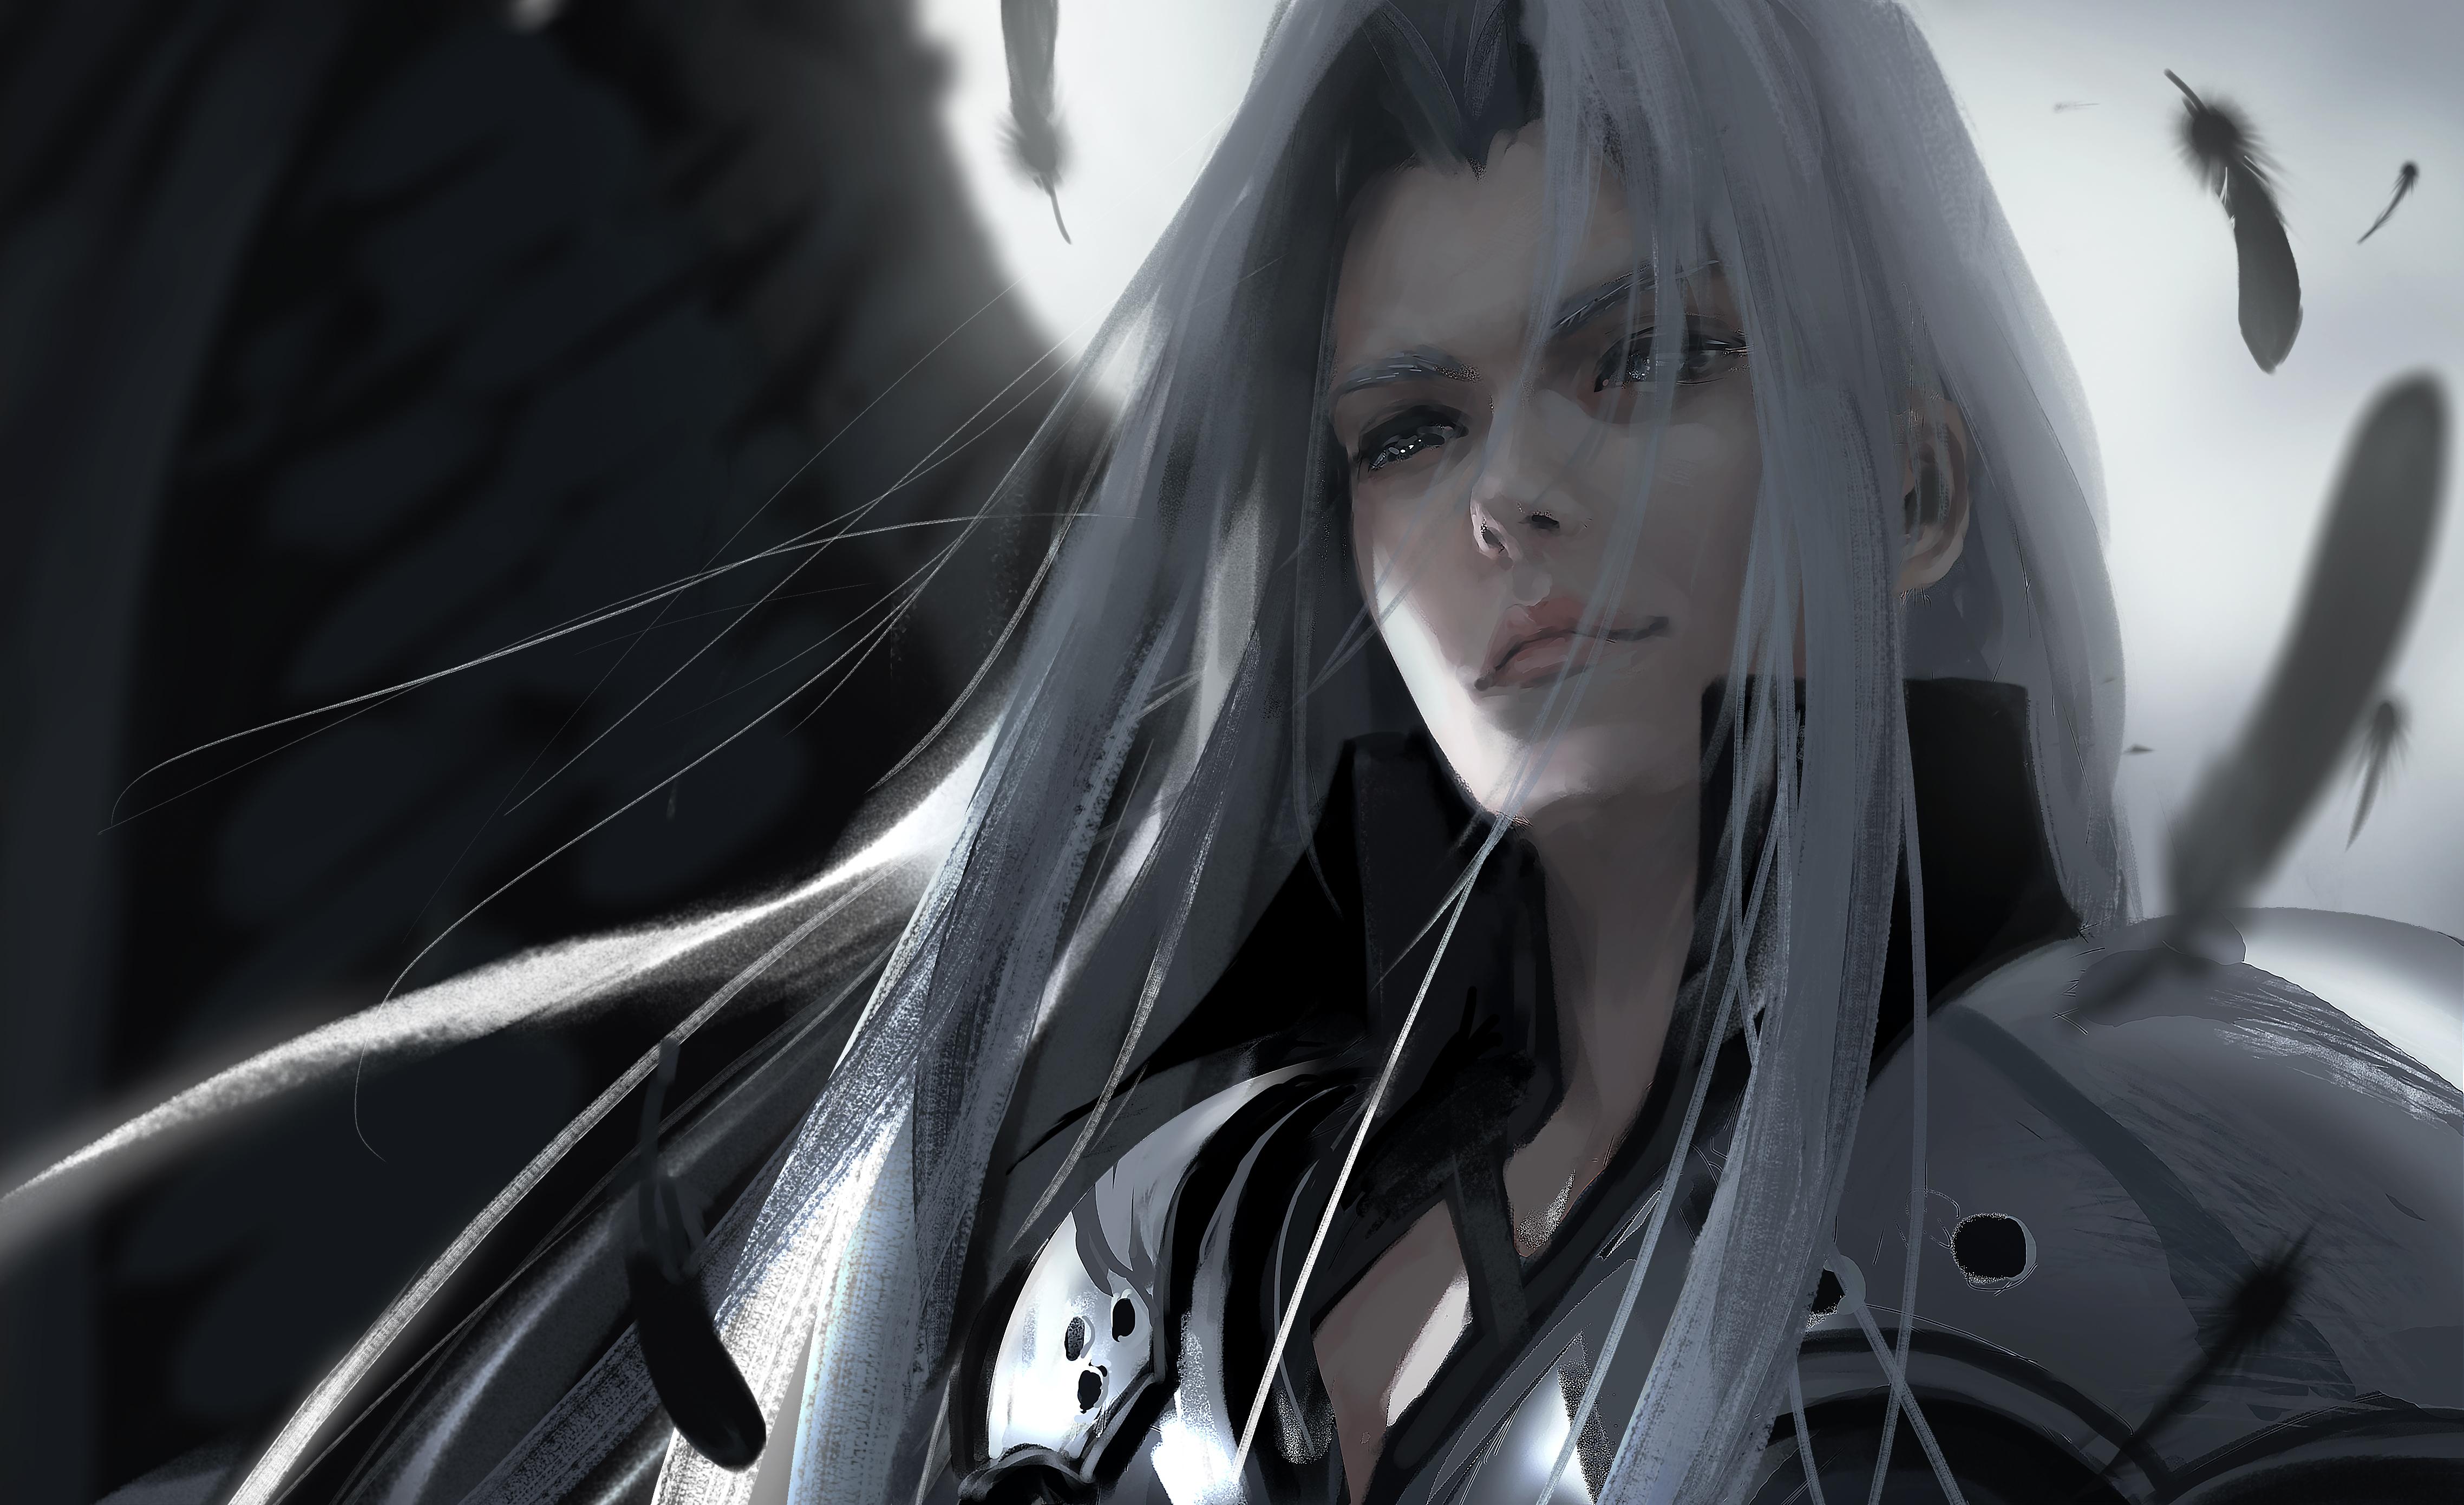 Wallpaper Wlop Final Fantasy Vii Sephiroth 4551x2779 C0mmanderino 1817361 Hd Wallpapers Wallhere